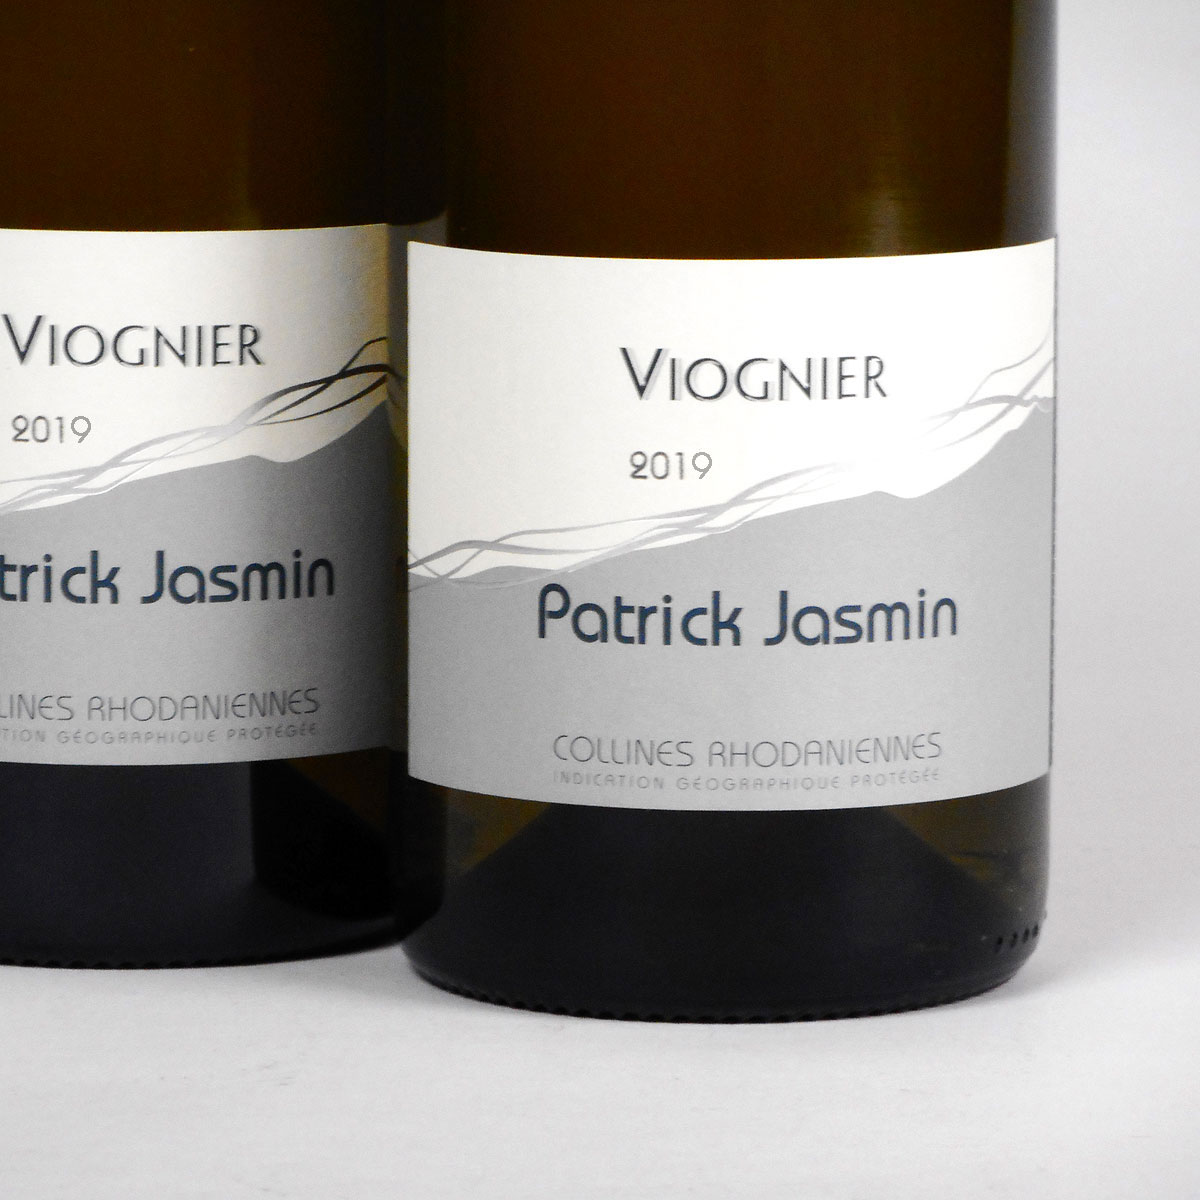 IGP Collines Rhodaniennes: Patrick Jasmin Viognier 2019